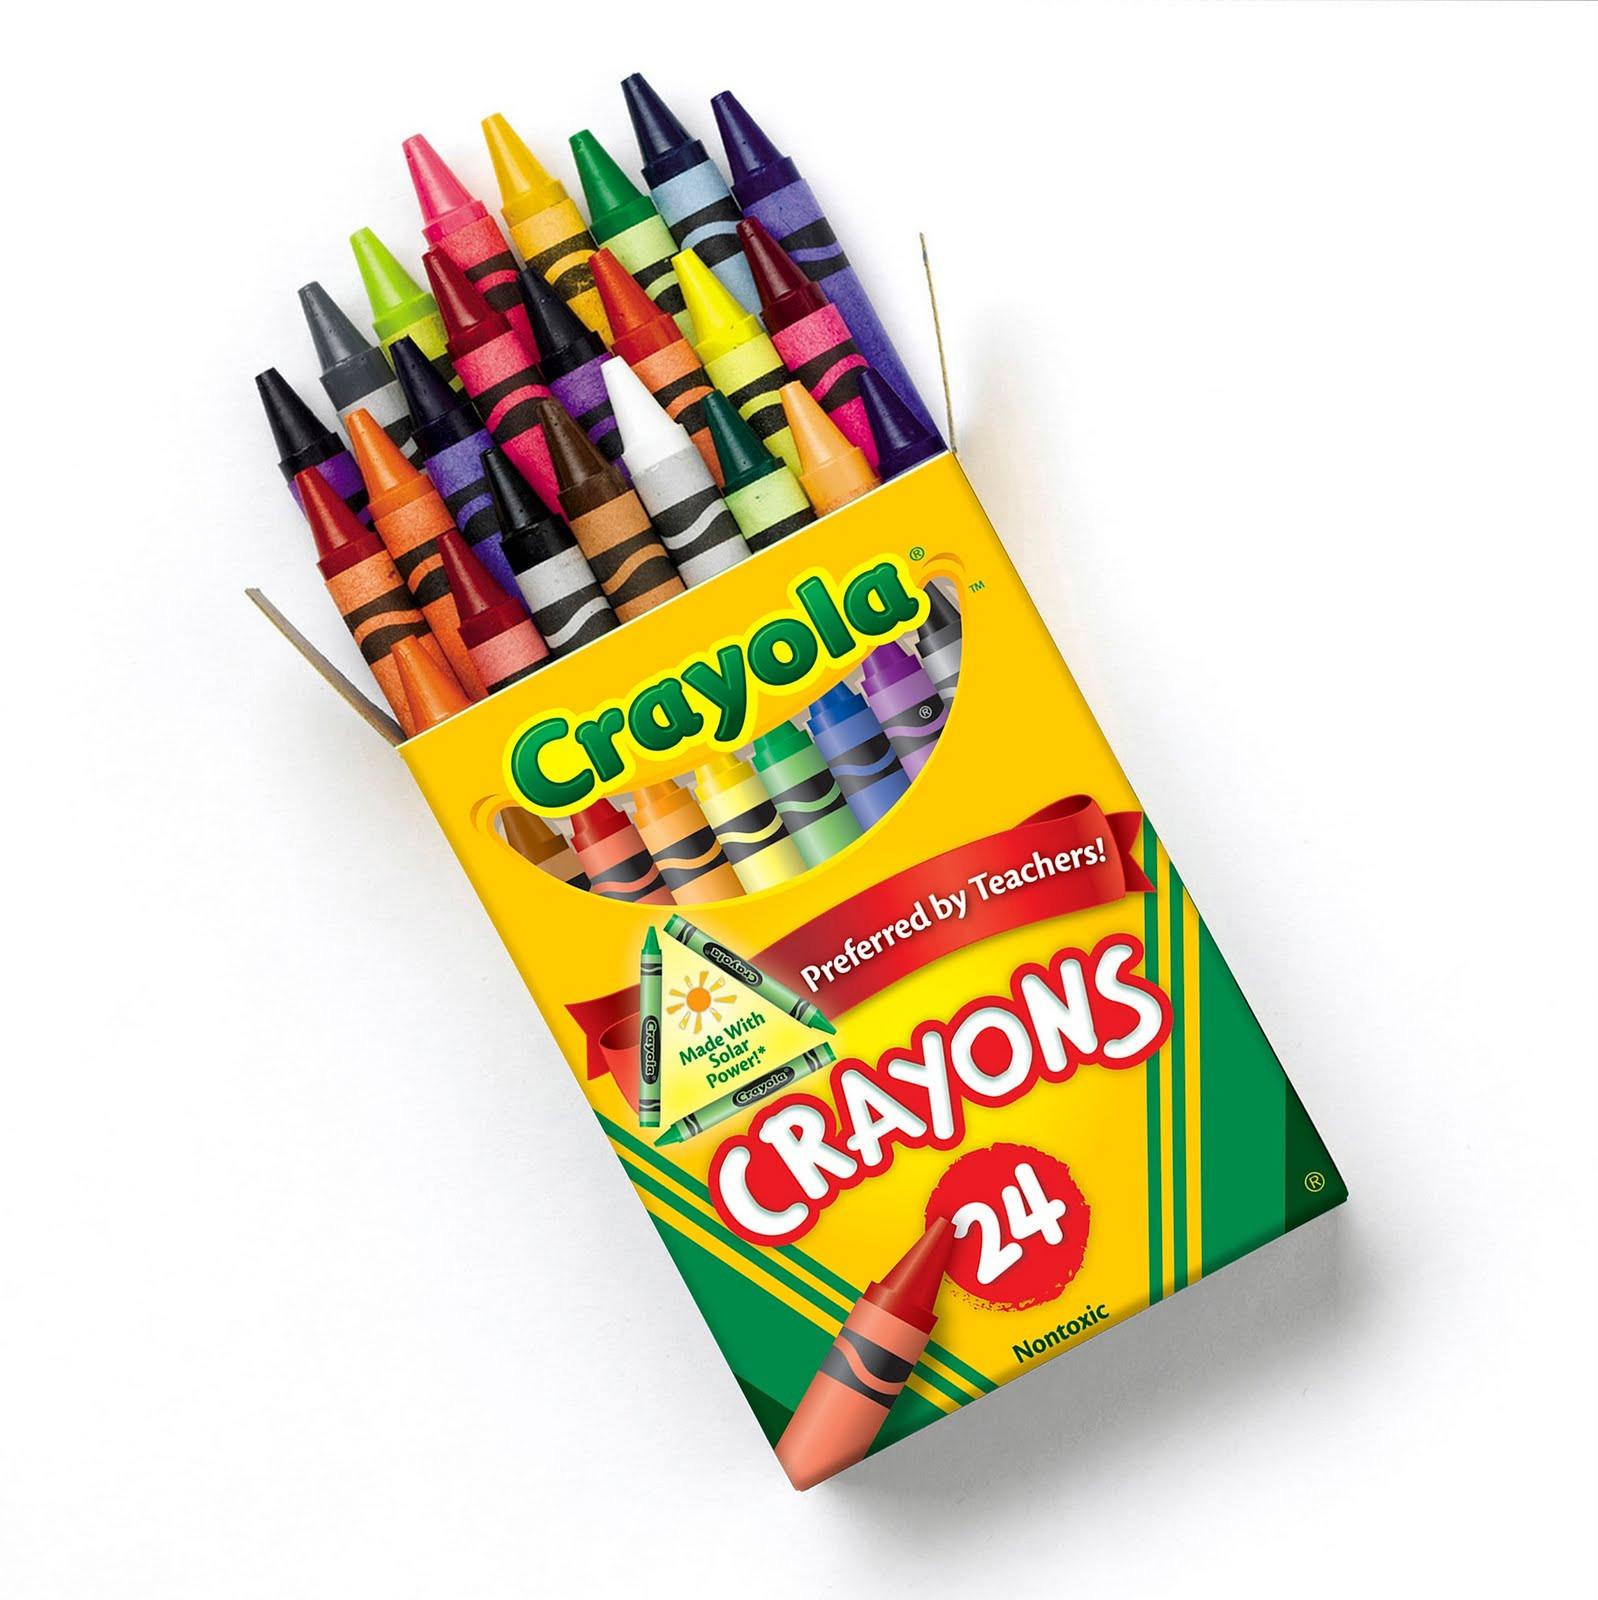 1598x1600 Crayola Crayon Clipart Danasojak Top 2 Stunning Clip Art